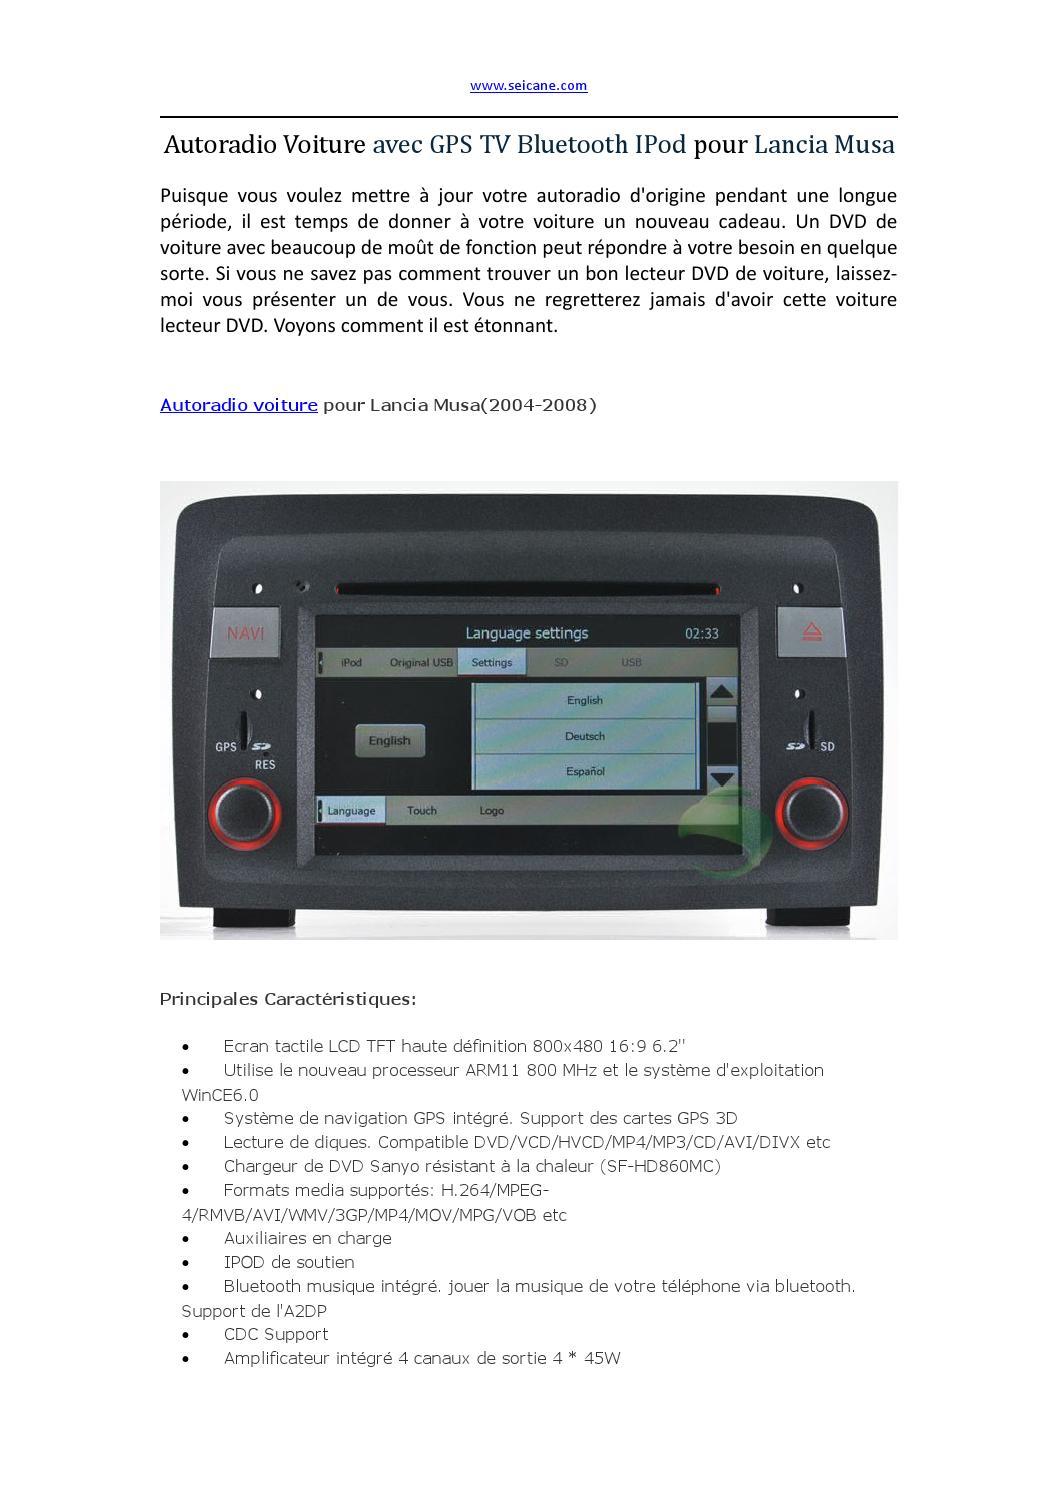 autoradio voiture avec gps tv bluetooth ipod pour lancia musa by baaron290 issuu. Black Bedroom Furniture Sets. Home Design Ideas